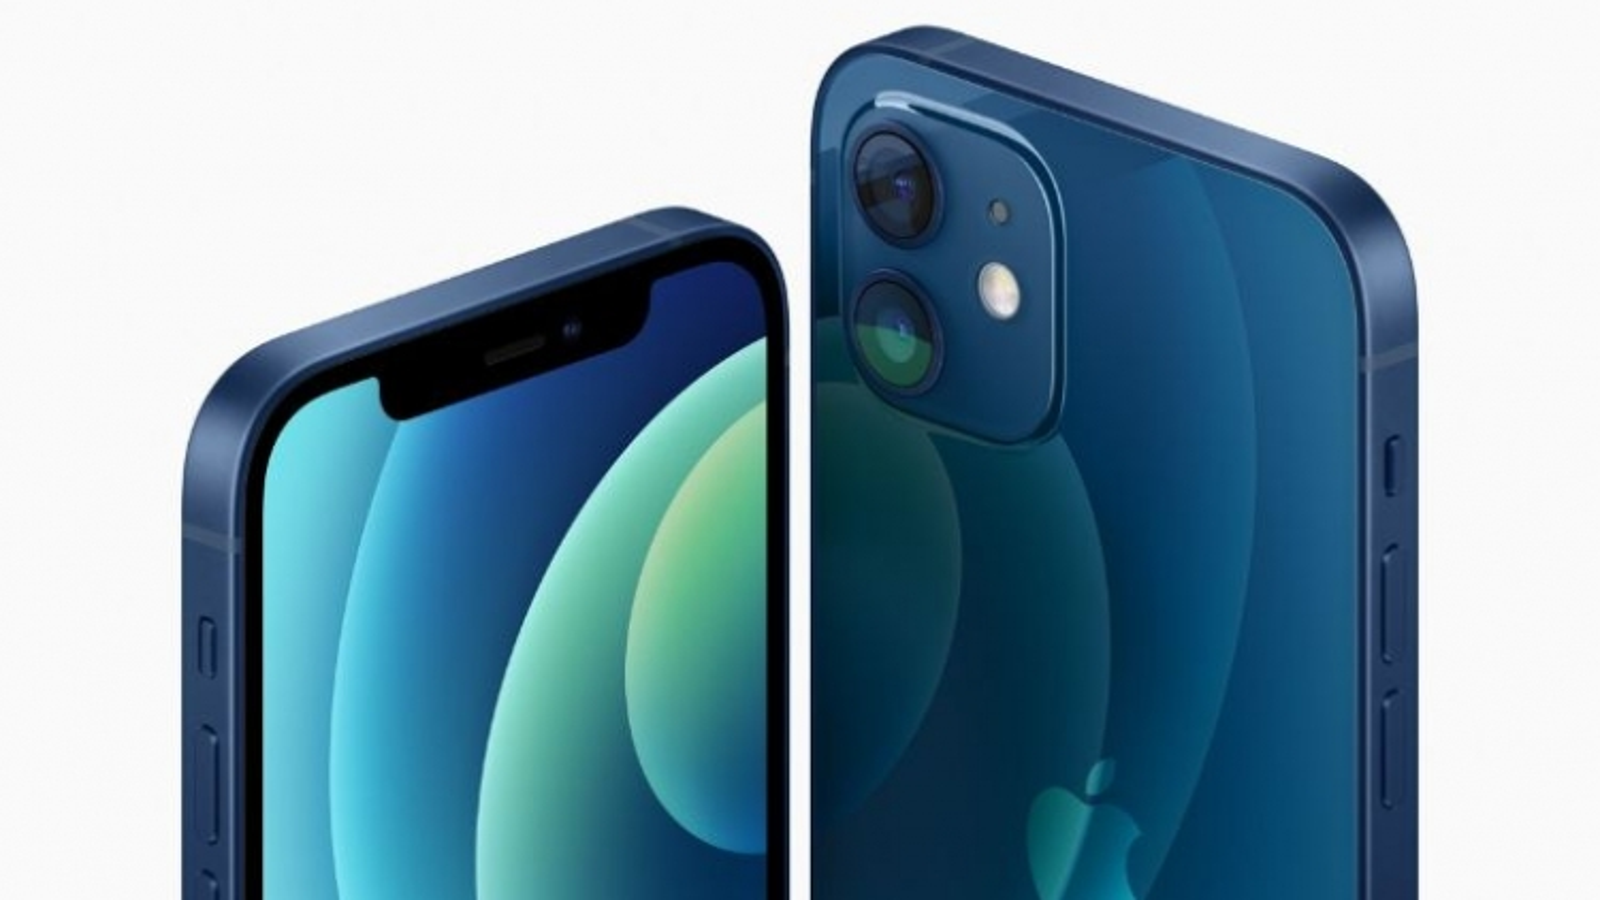 Nên mua iPhone 12 hay iPhone 12 Pro?